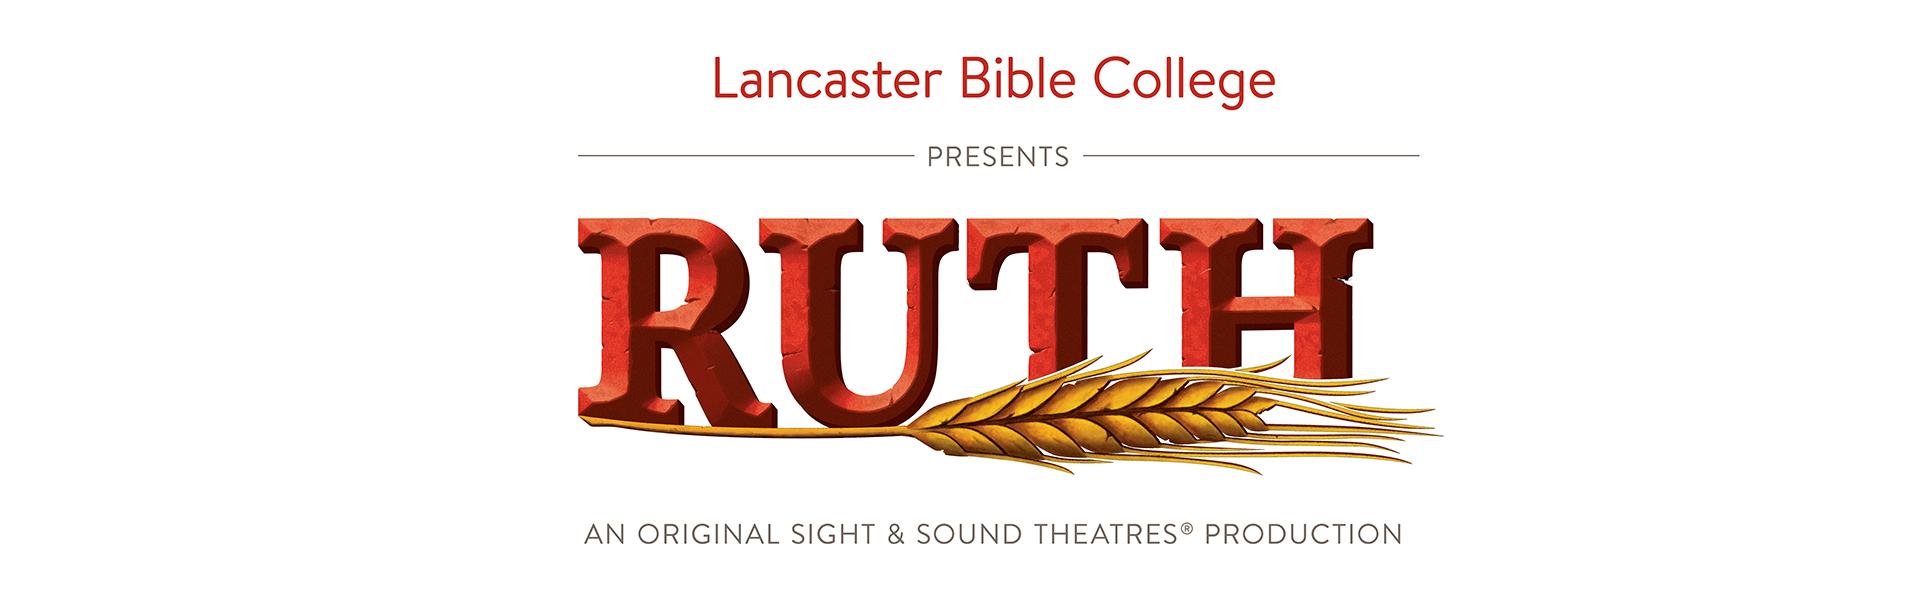 Sight & Sound's Original Production at Lancaster Bible College